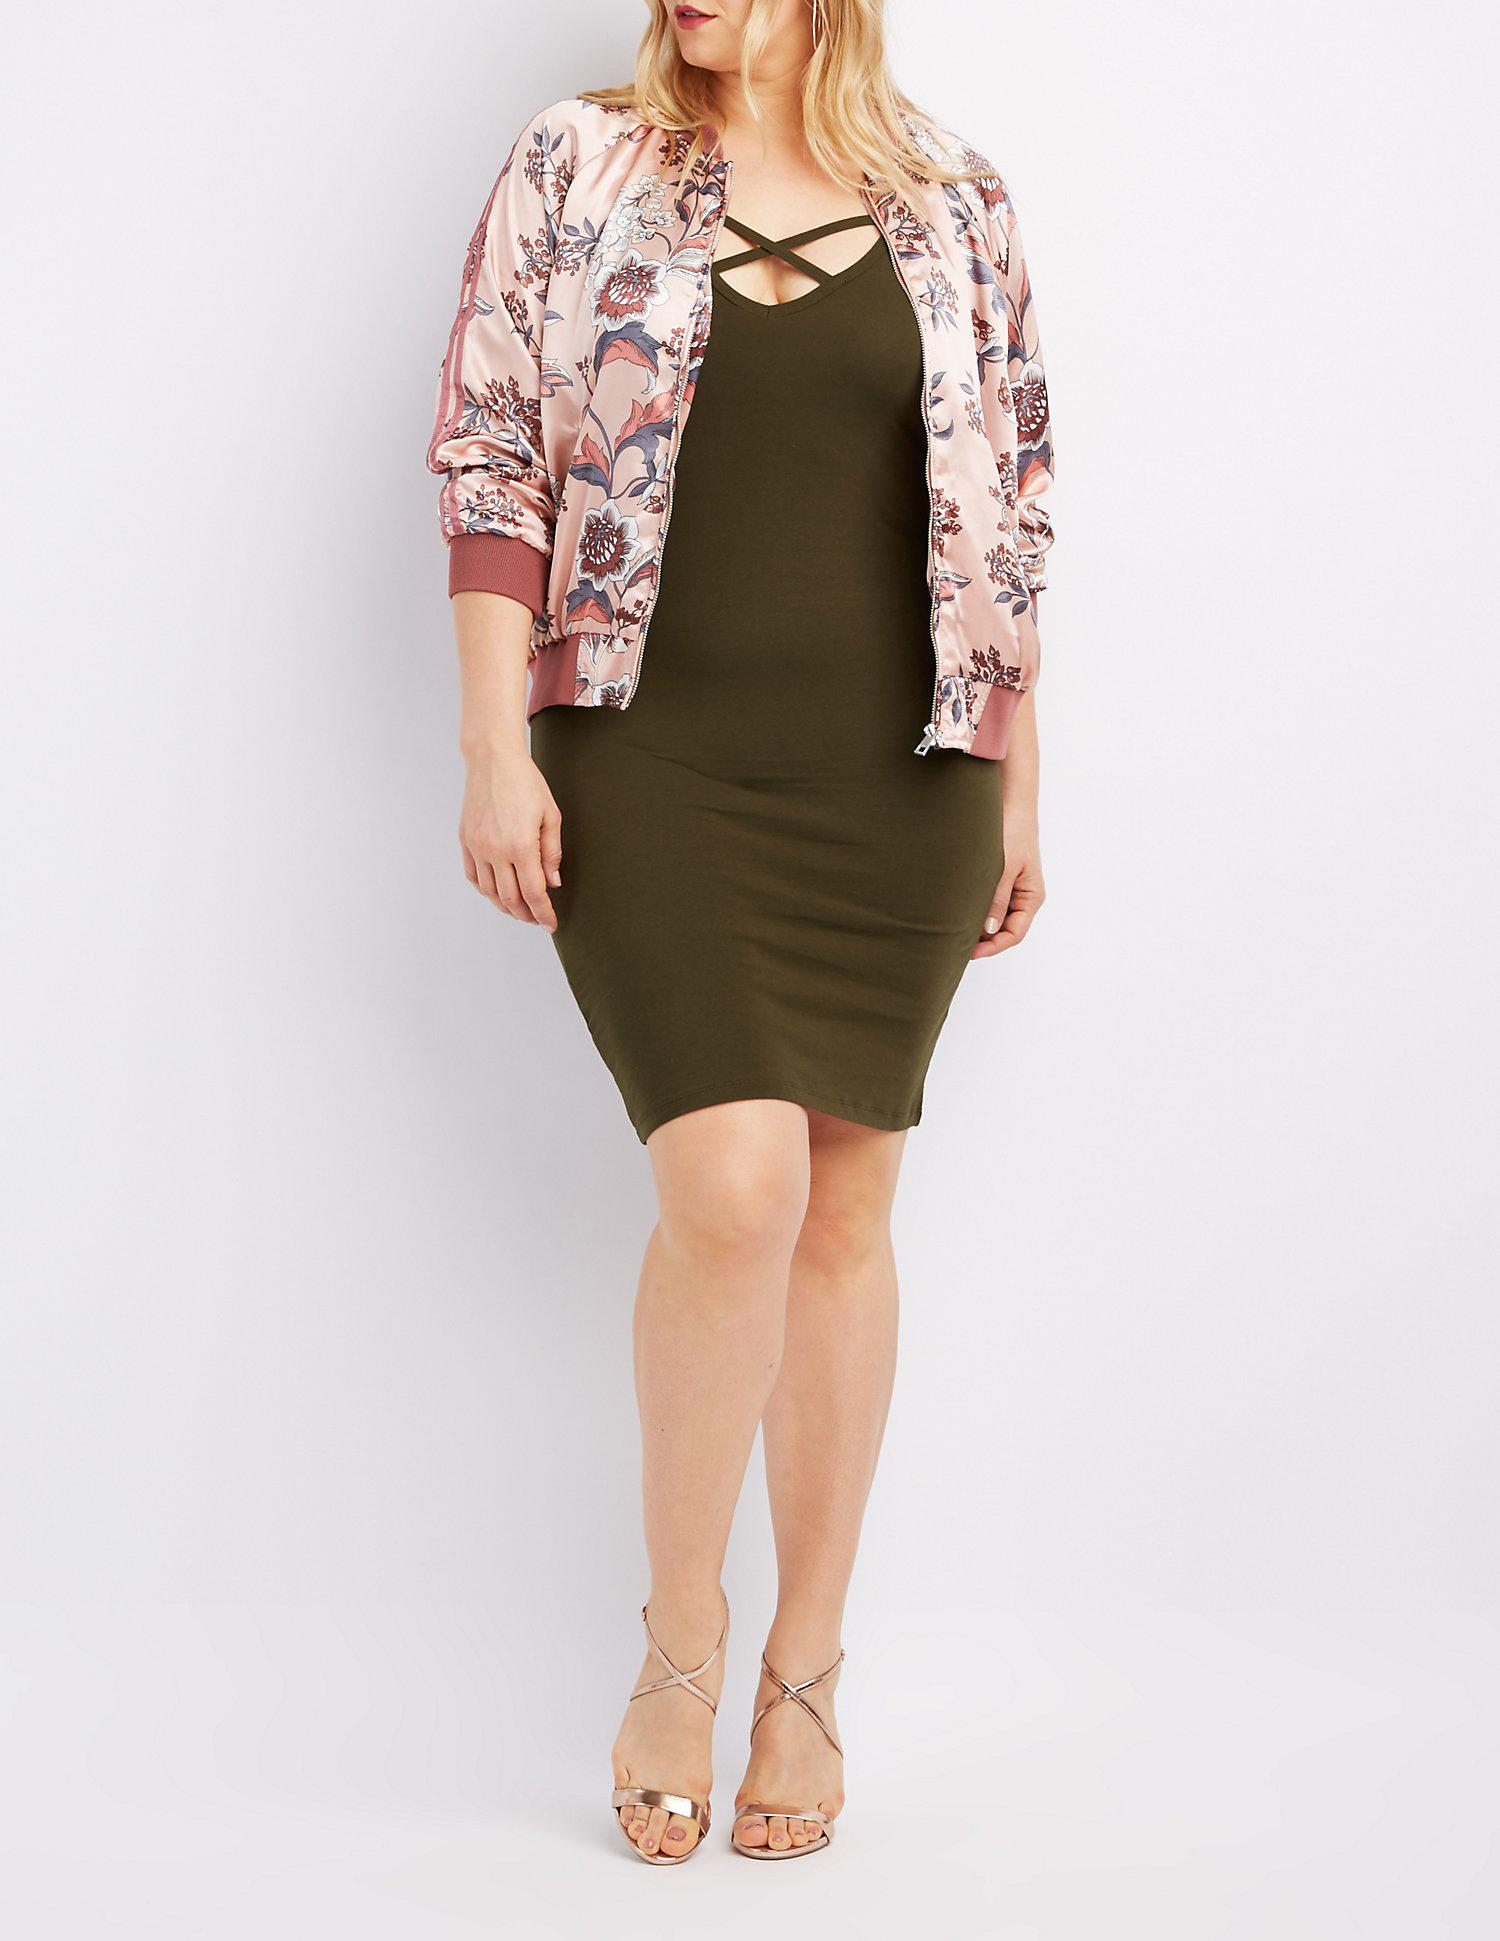 d17072855e1 Lyst - Charlotte Russe Plus Size Floral Satin Bomber Jacket